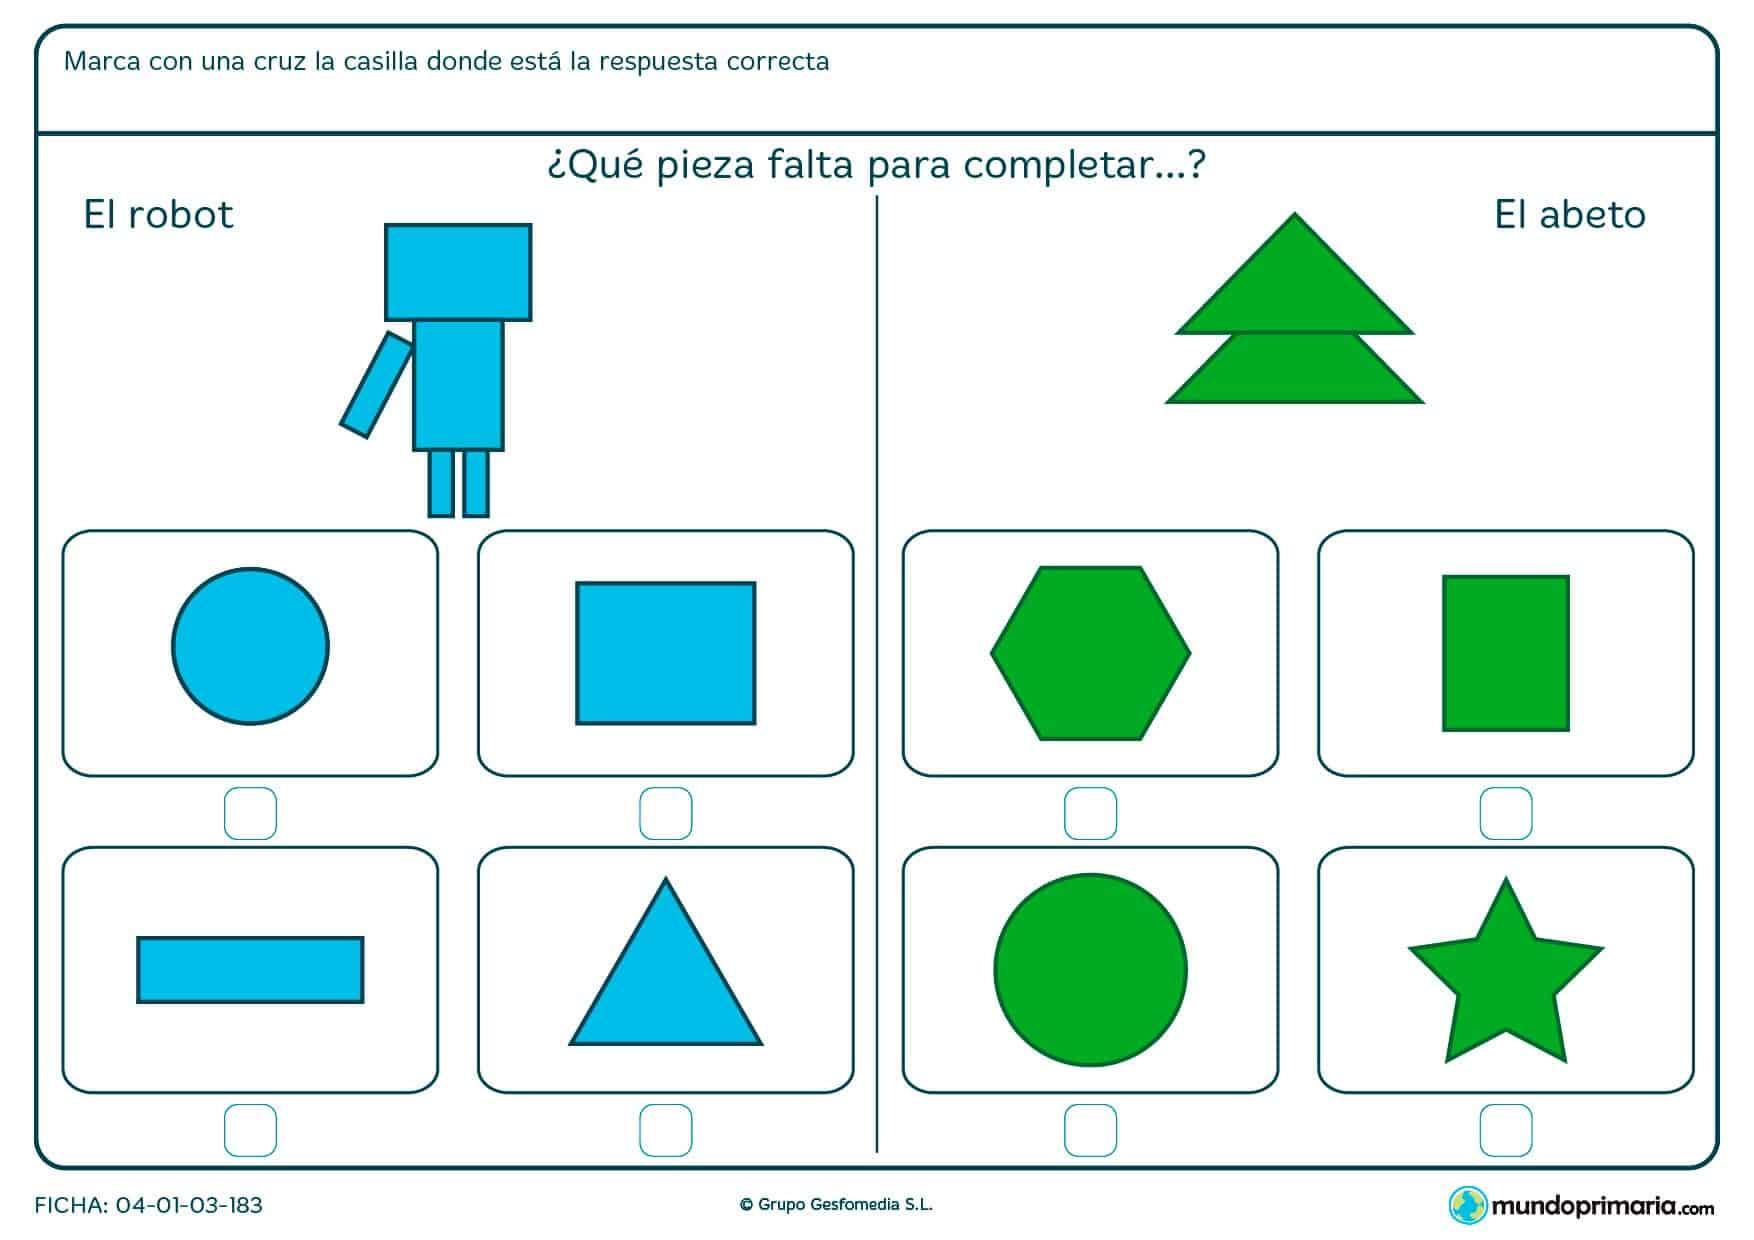 Ficha de elegir la figura que completa el dibujo en la que tendrás que elegir la forma poligonal que falta en la figura.